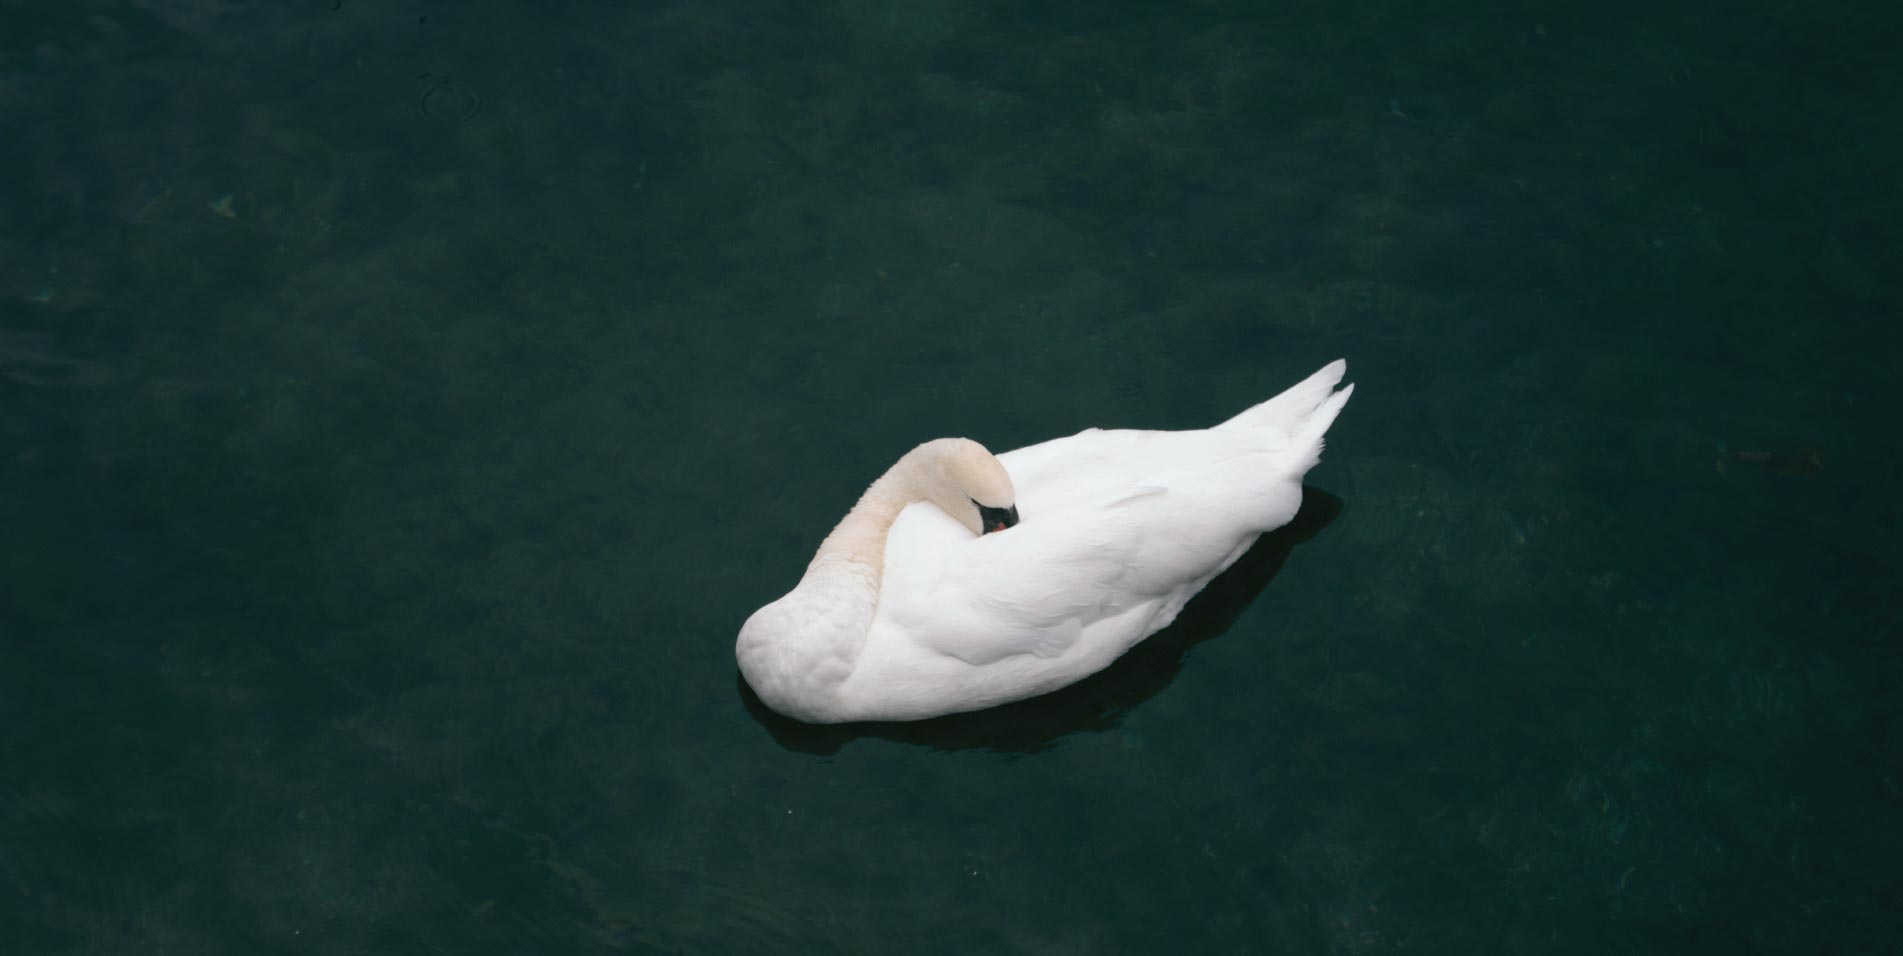 Swan swimming on a lake